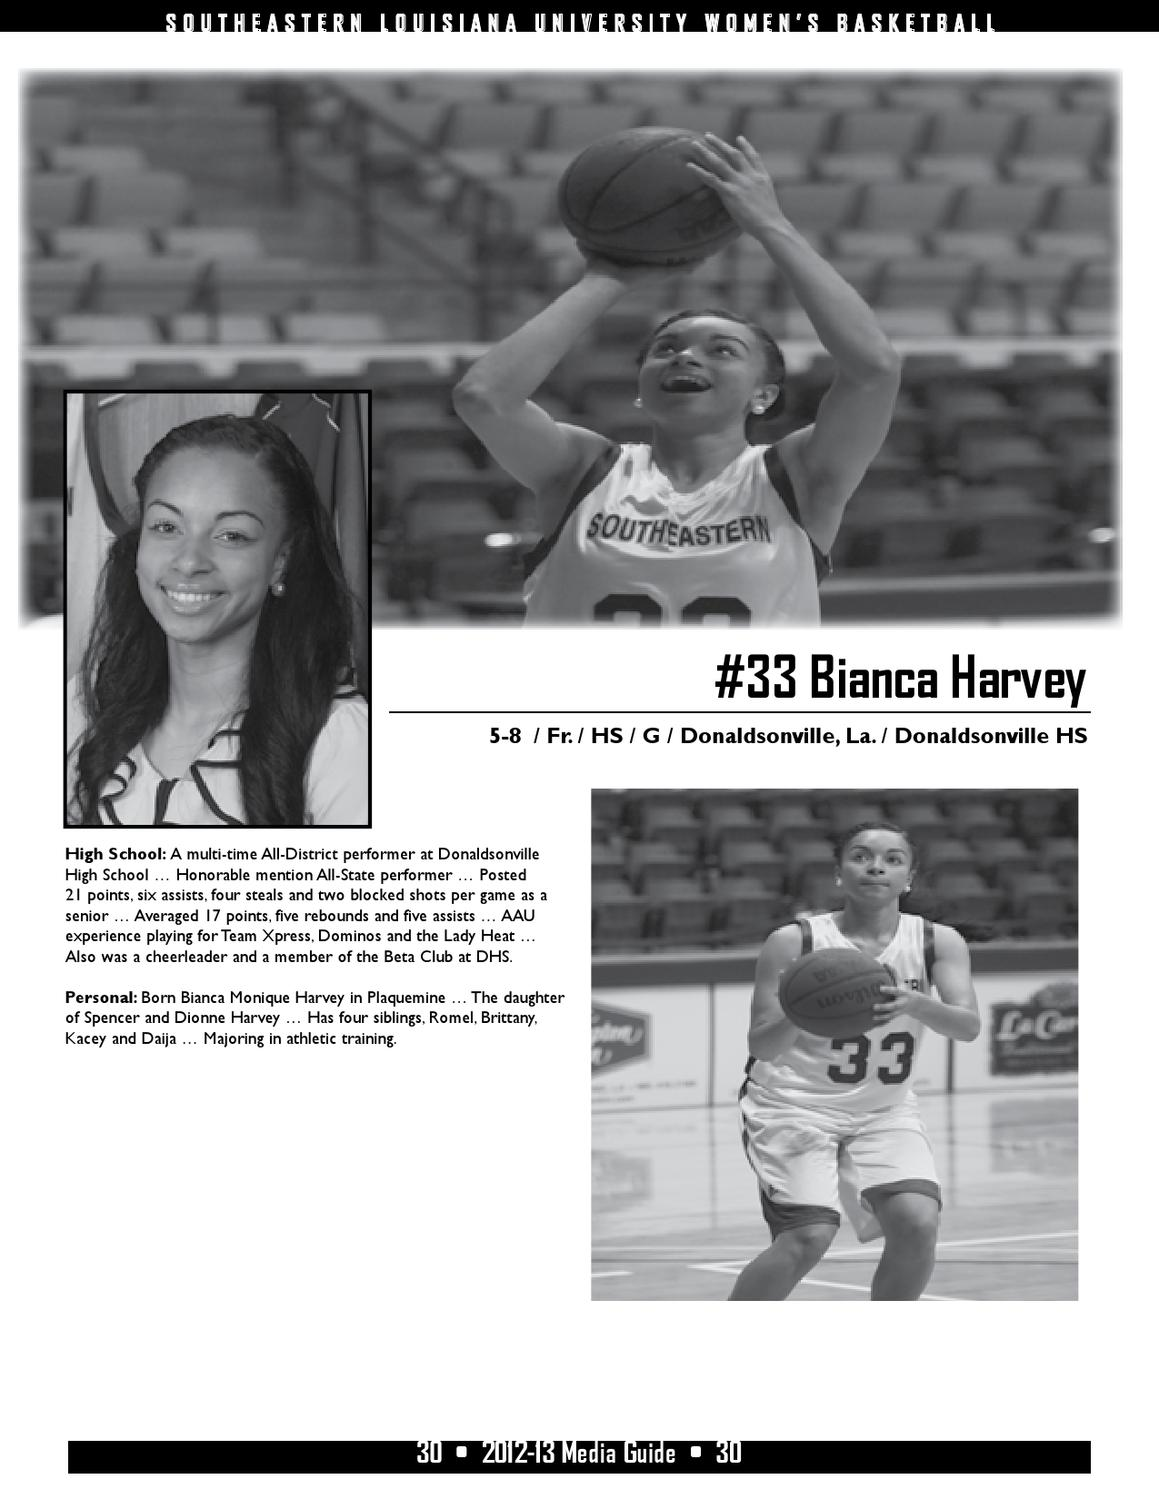 2012 13 Southeastern Womens Basketball Media Guide By Southeastern